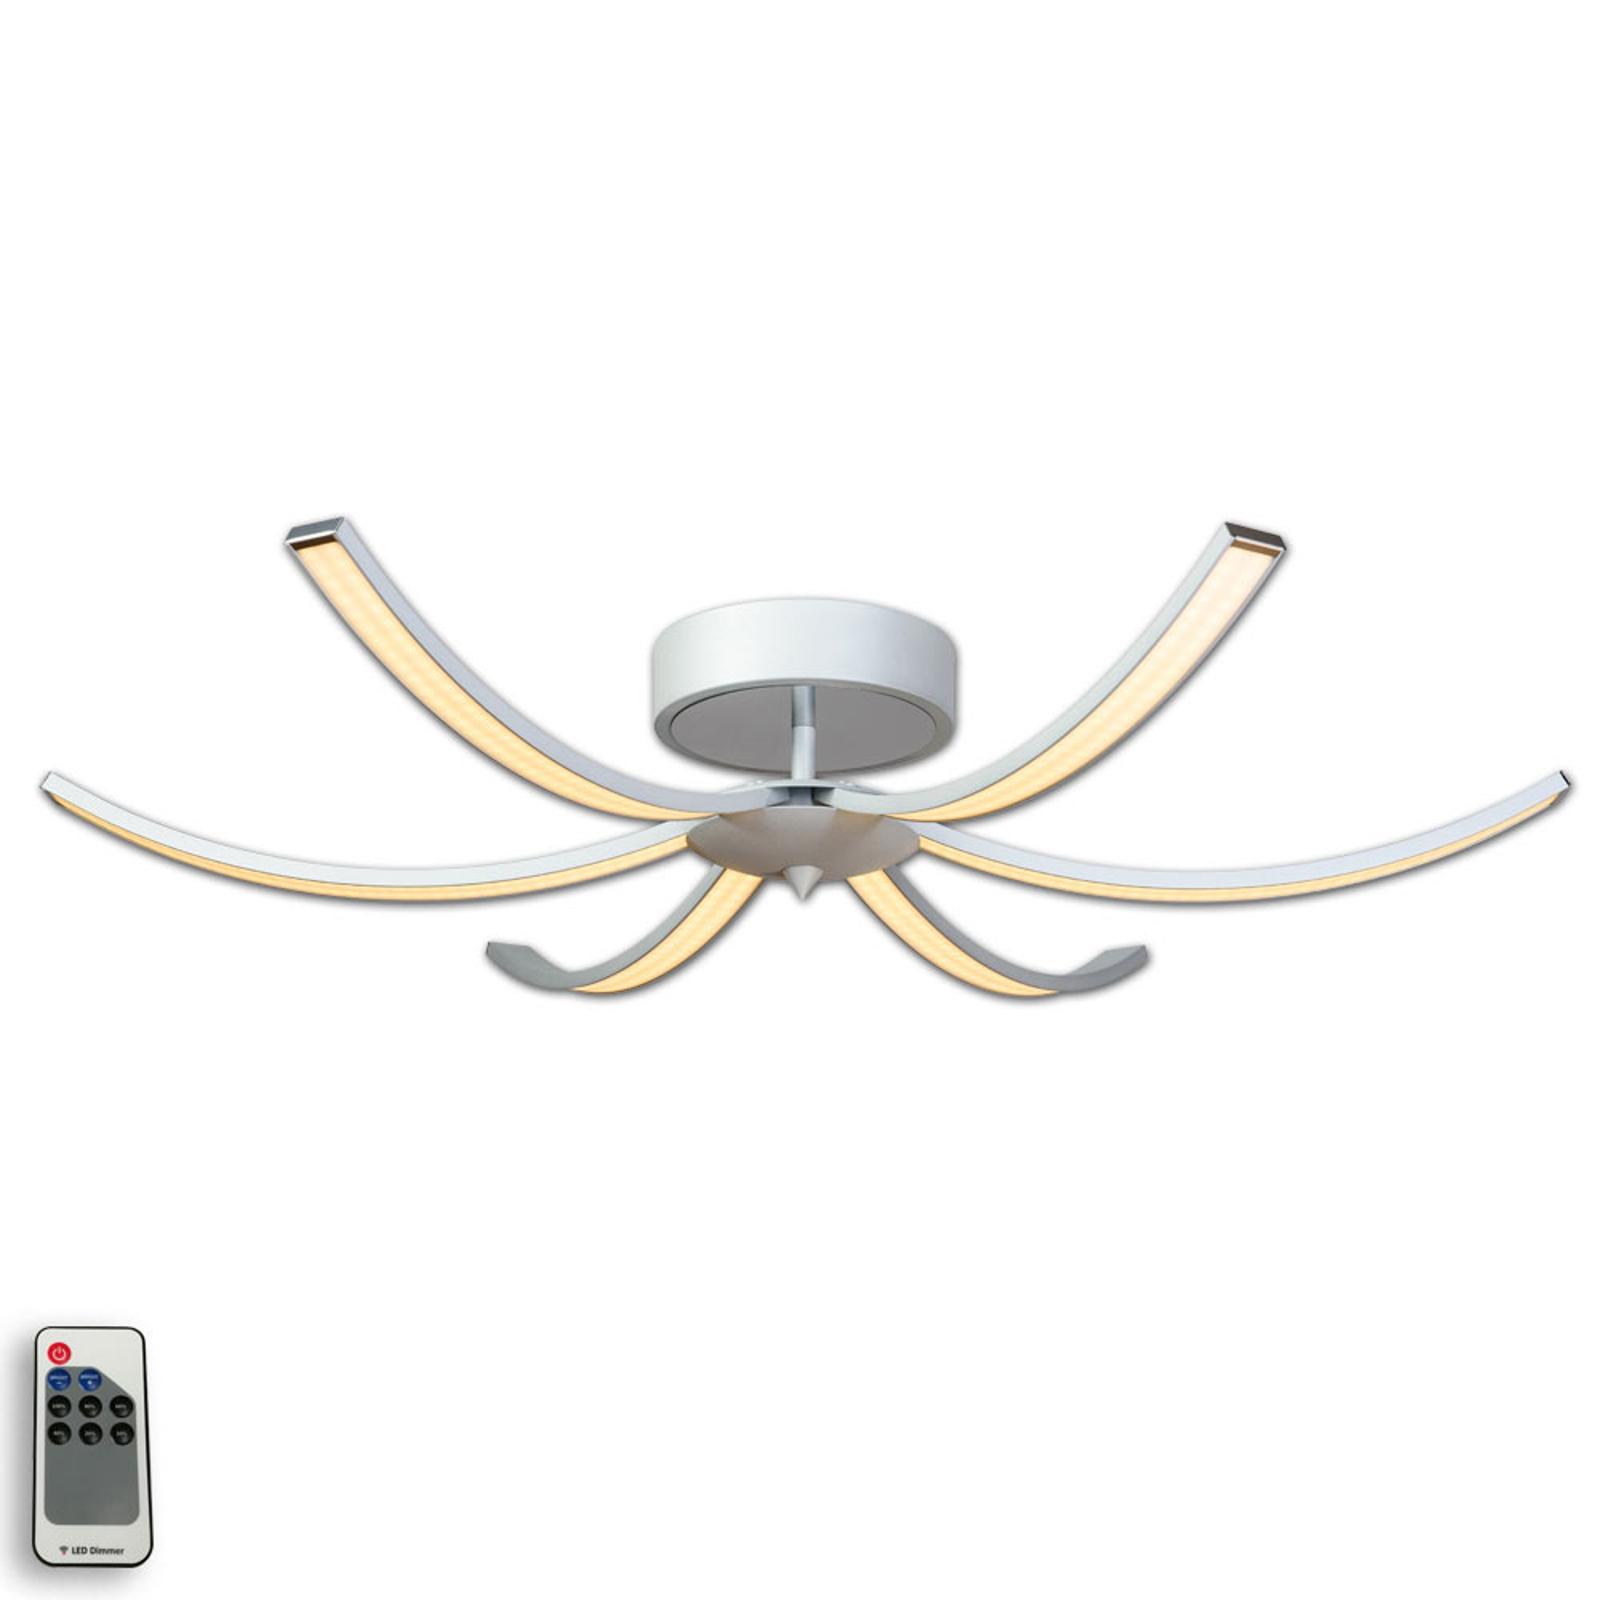 LED plafondlamp Largo 91 cm 6-lamps alu